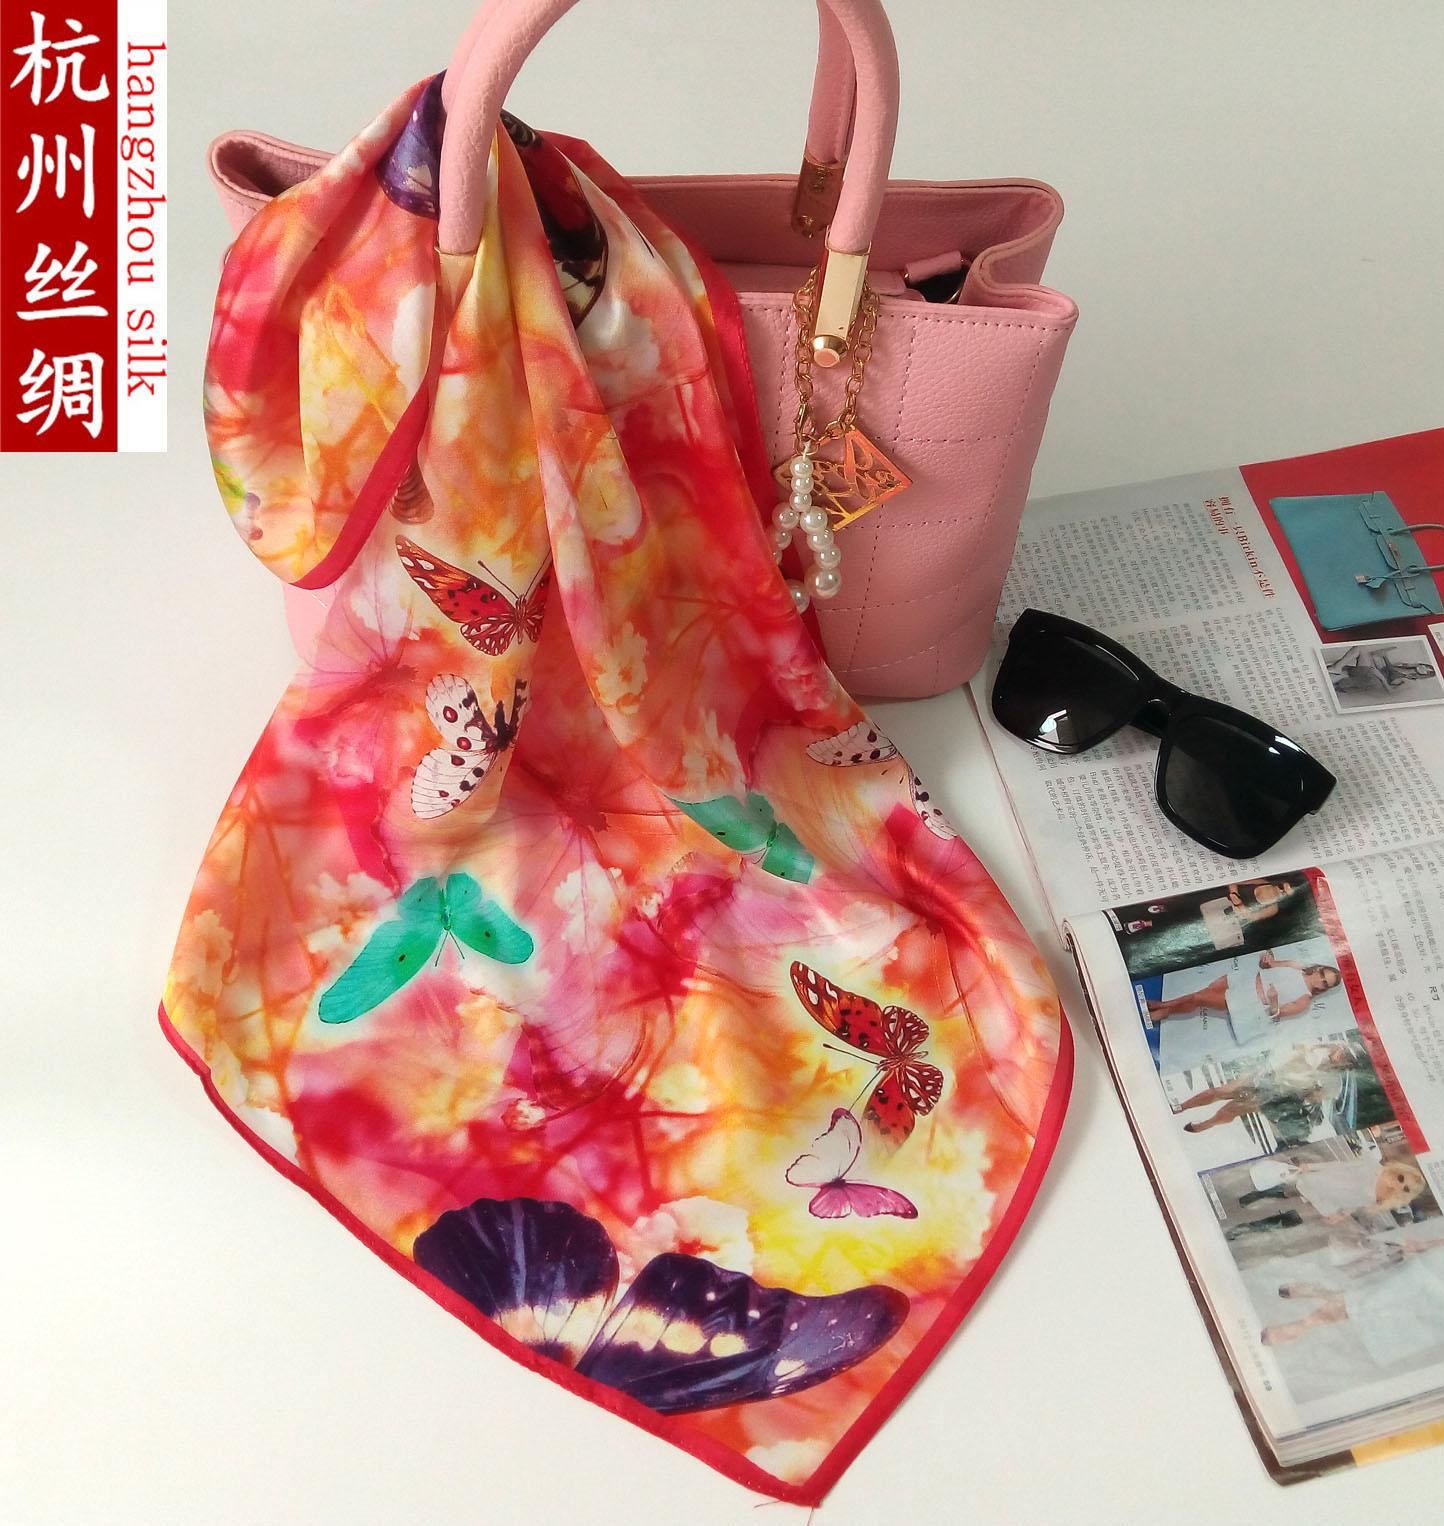 Hangzhou silk plain crepe satin silk scarf Real Silk Scarf 100% mulberry silk scarf small square scarf Bib bag silk scarf